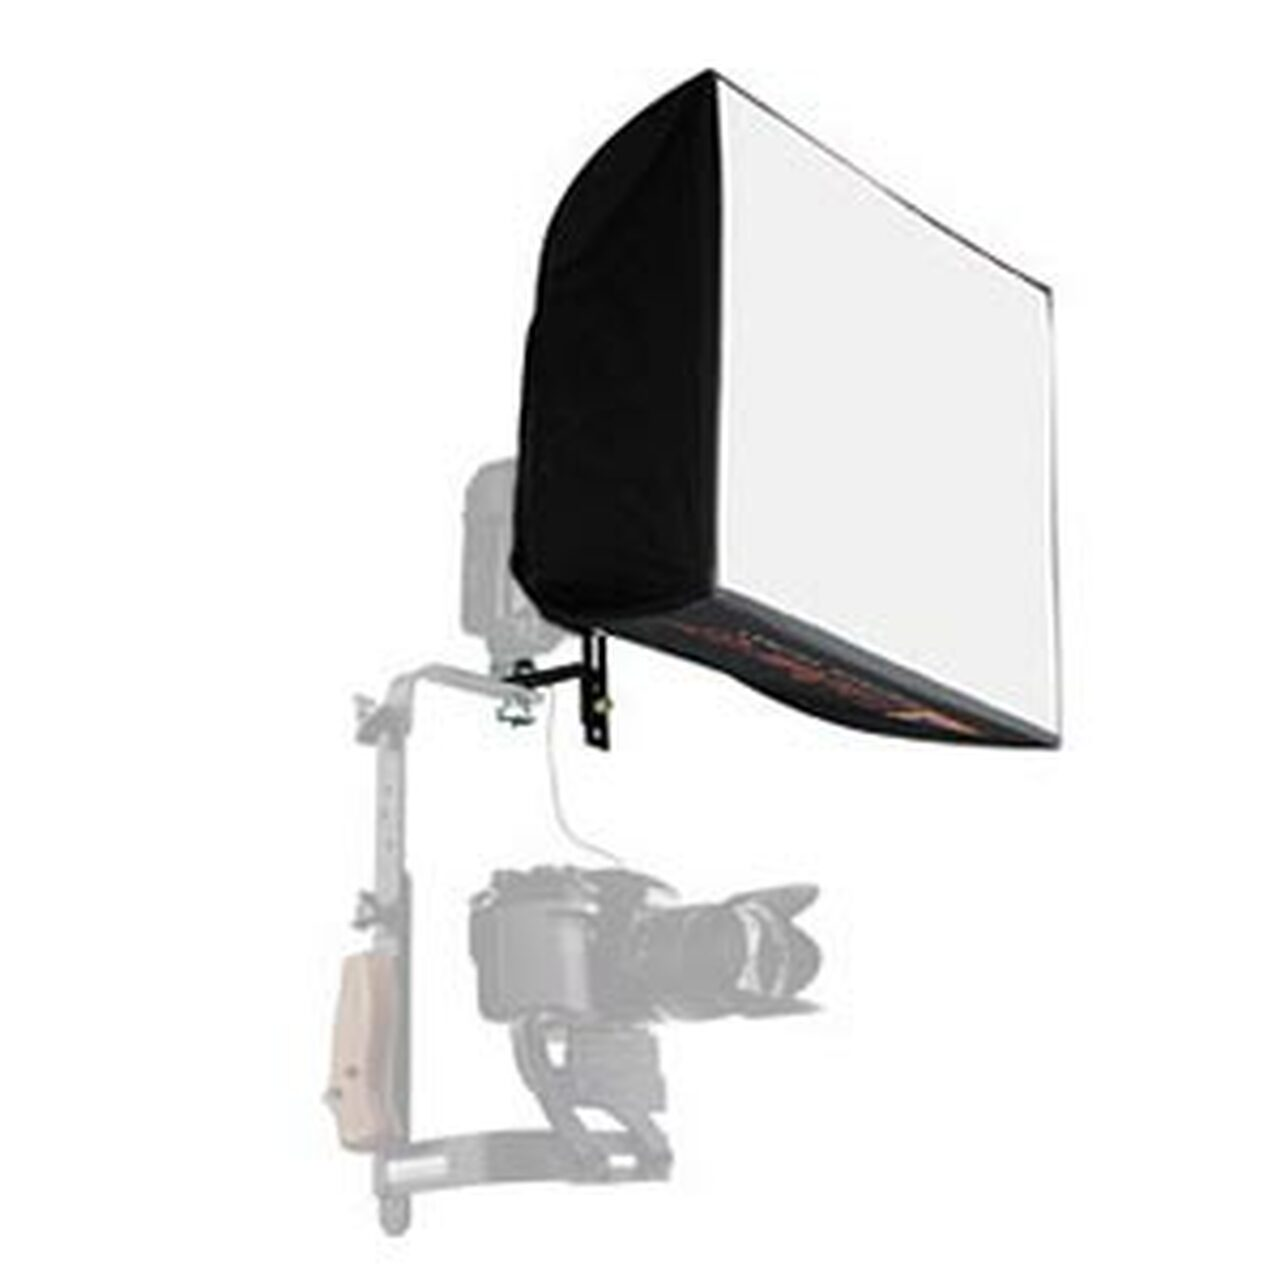 Photoflex X-Small LiteDome Kit